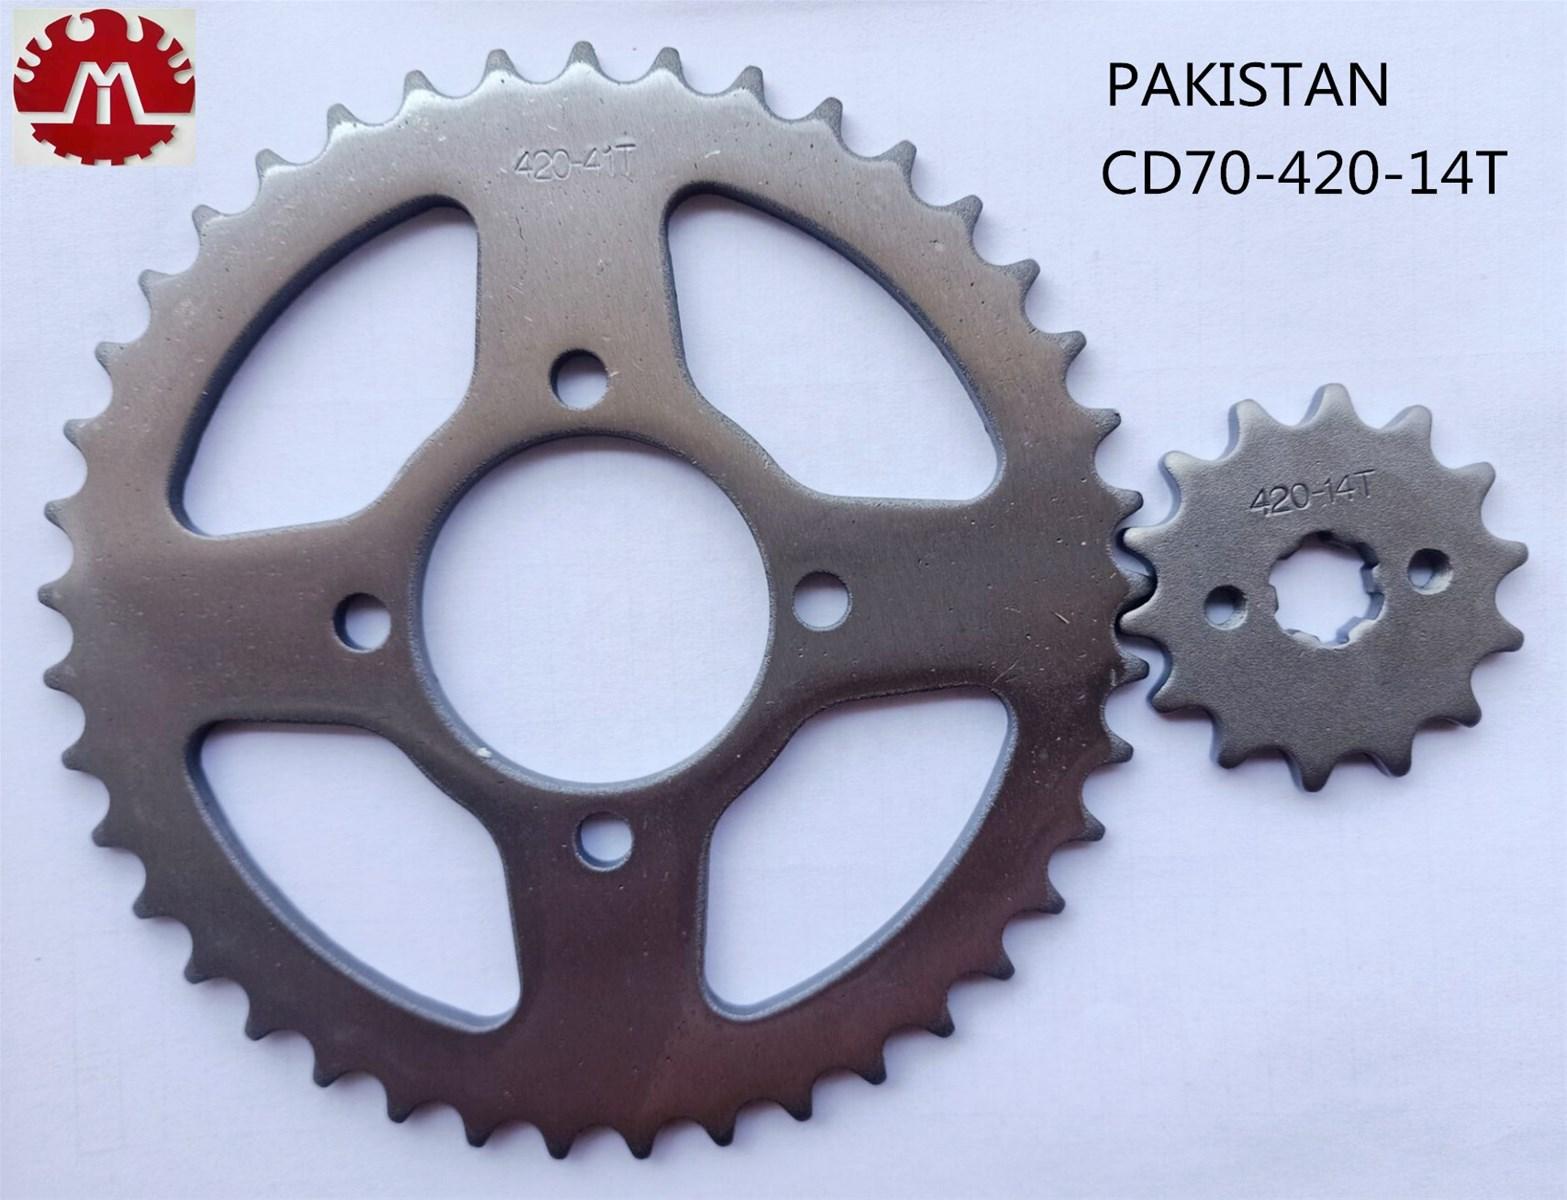 OEM Honda CD70 Motorcycle Sprocket Chain For Pakistan